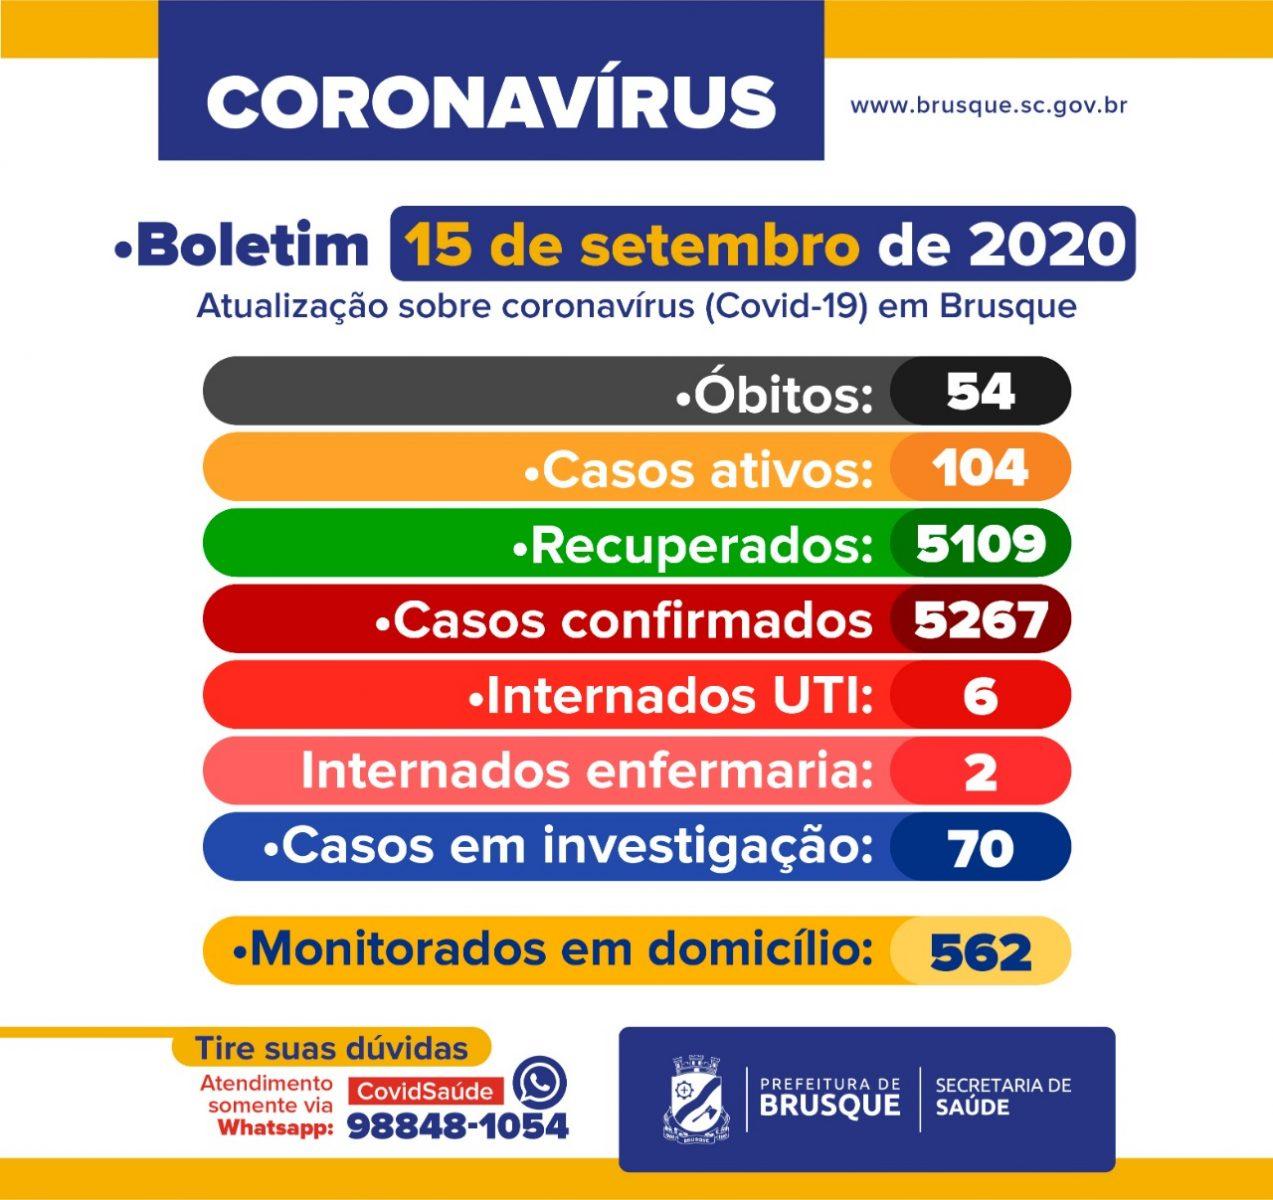 COVID-19: Boletim epidemiológico desta terça-feira, 15 de setembro